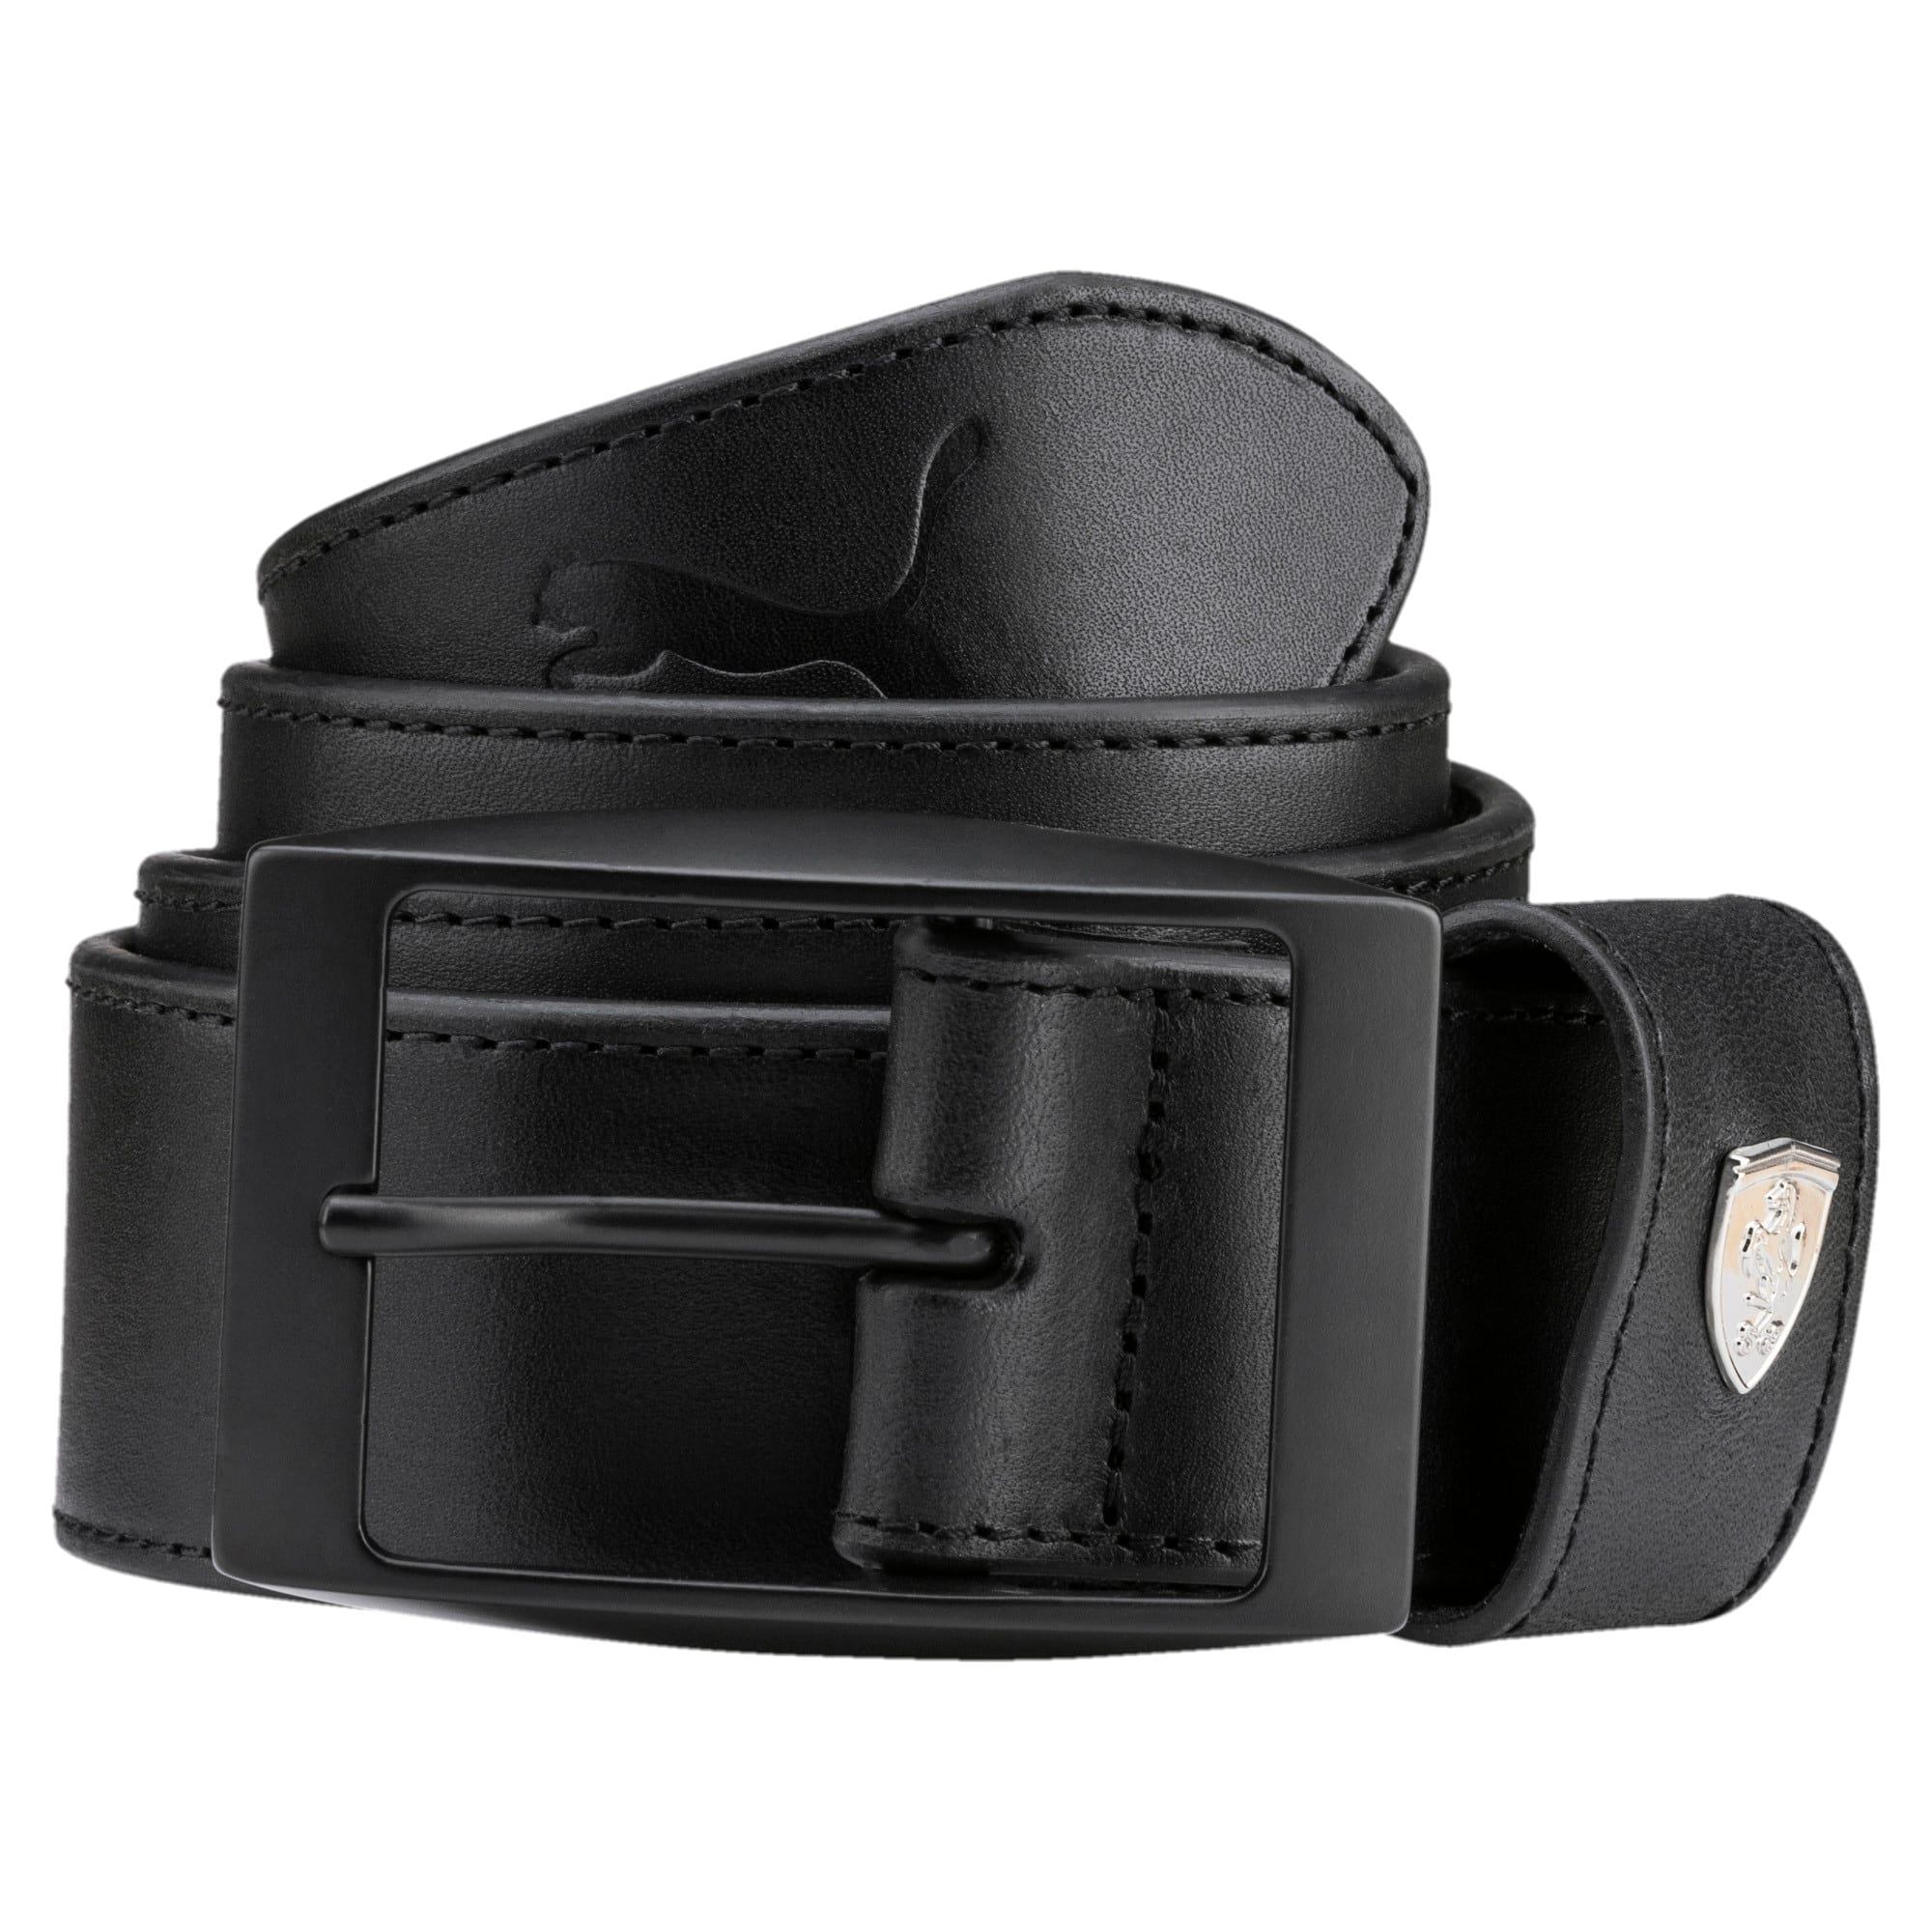 Thumbnail 1 of Ferrari LS Leather Belt, Puma Black, medium-IND